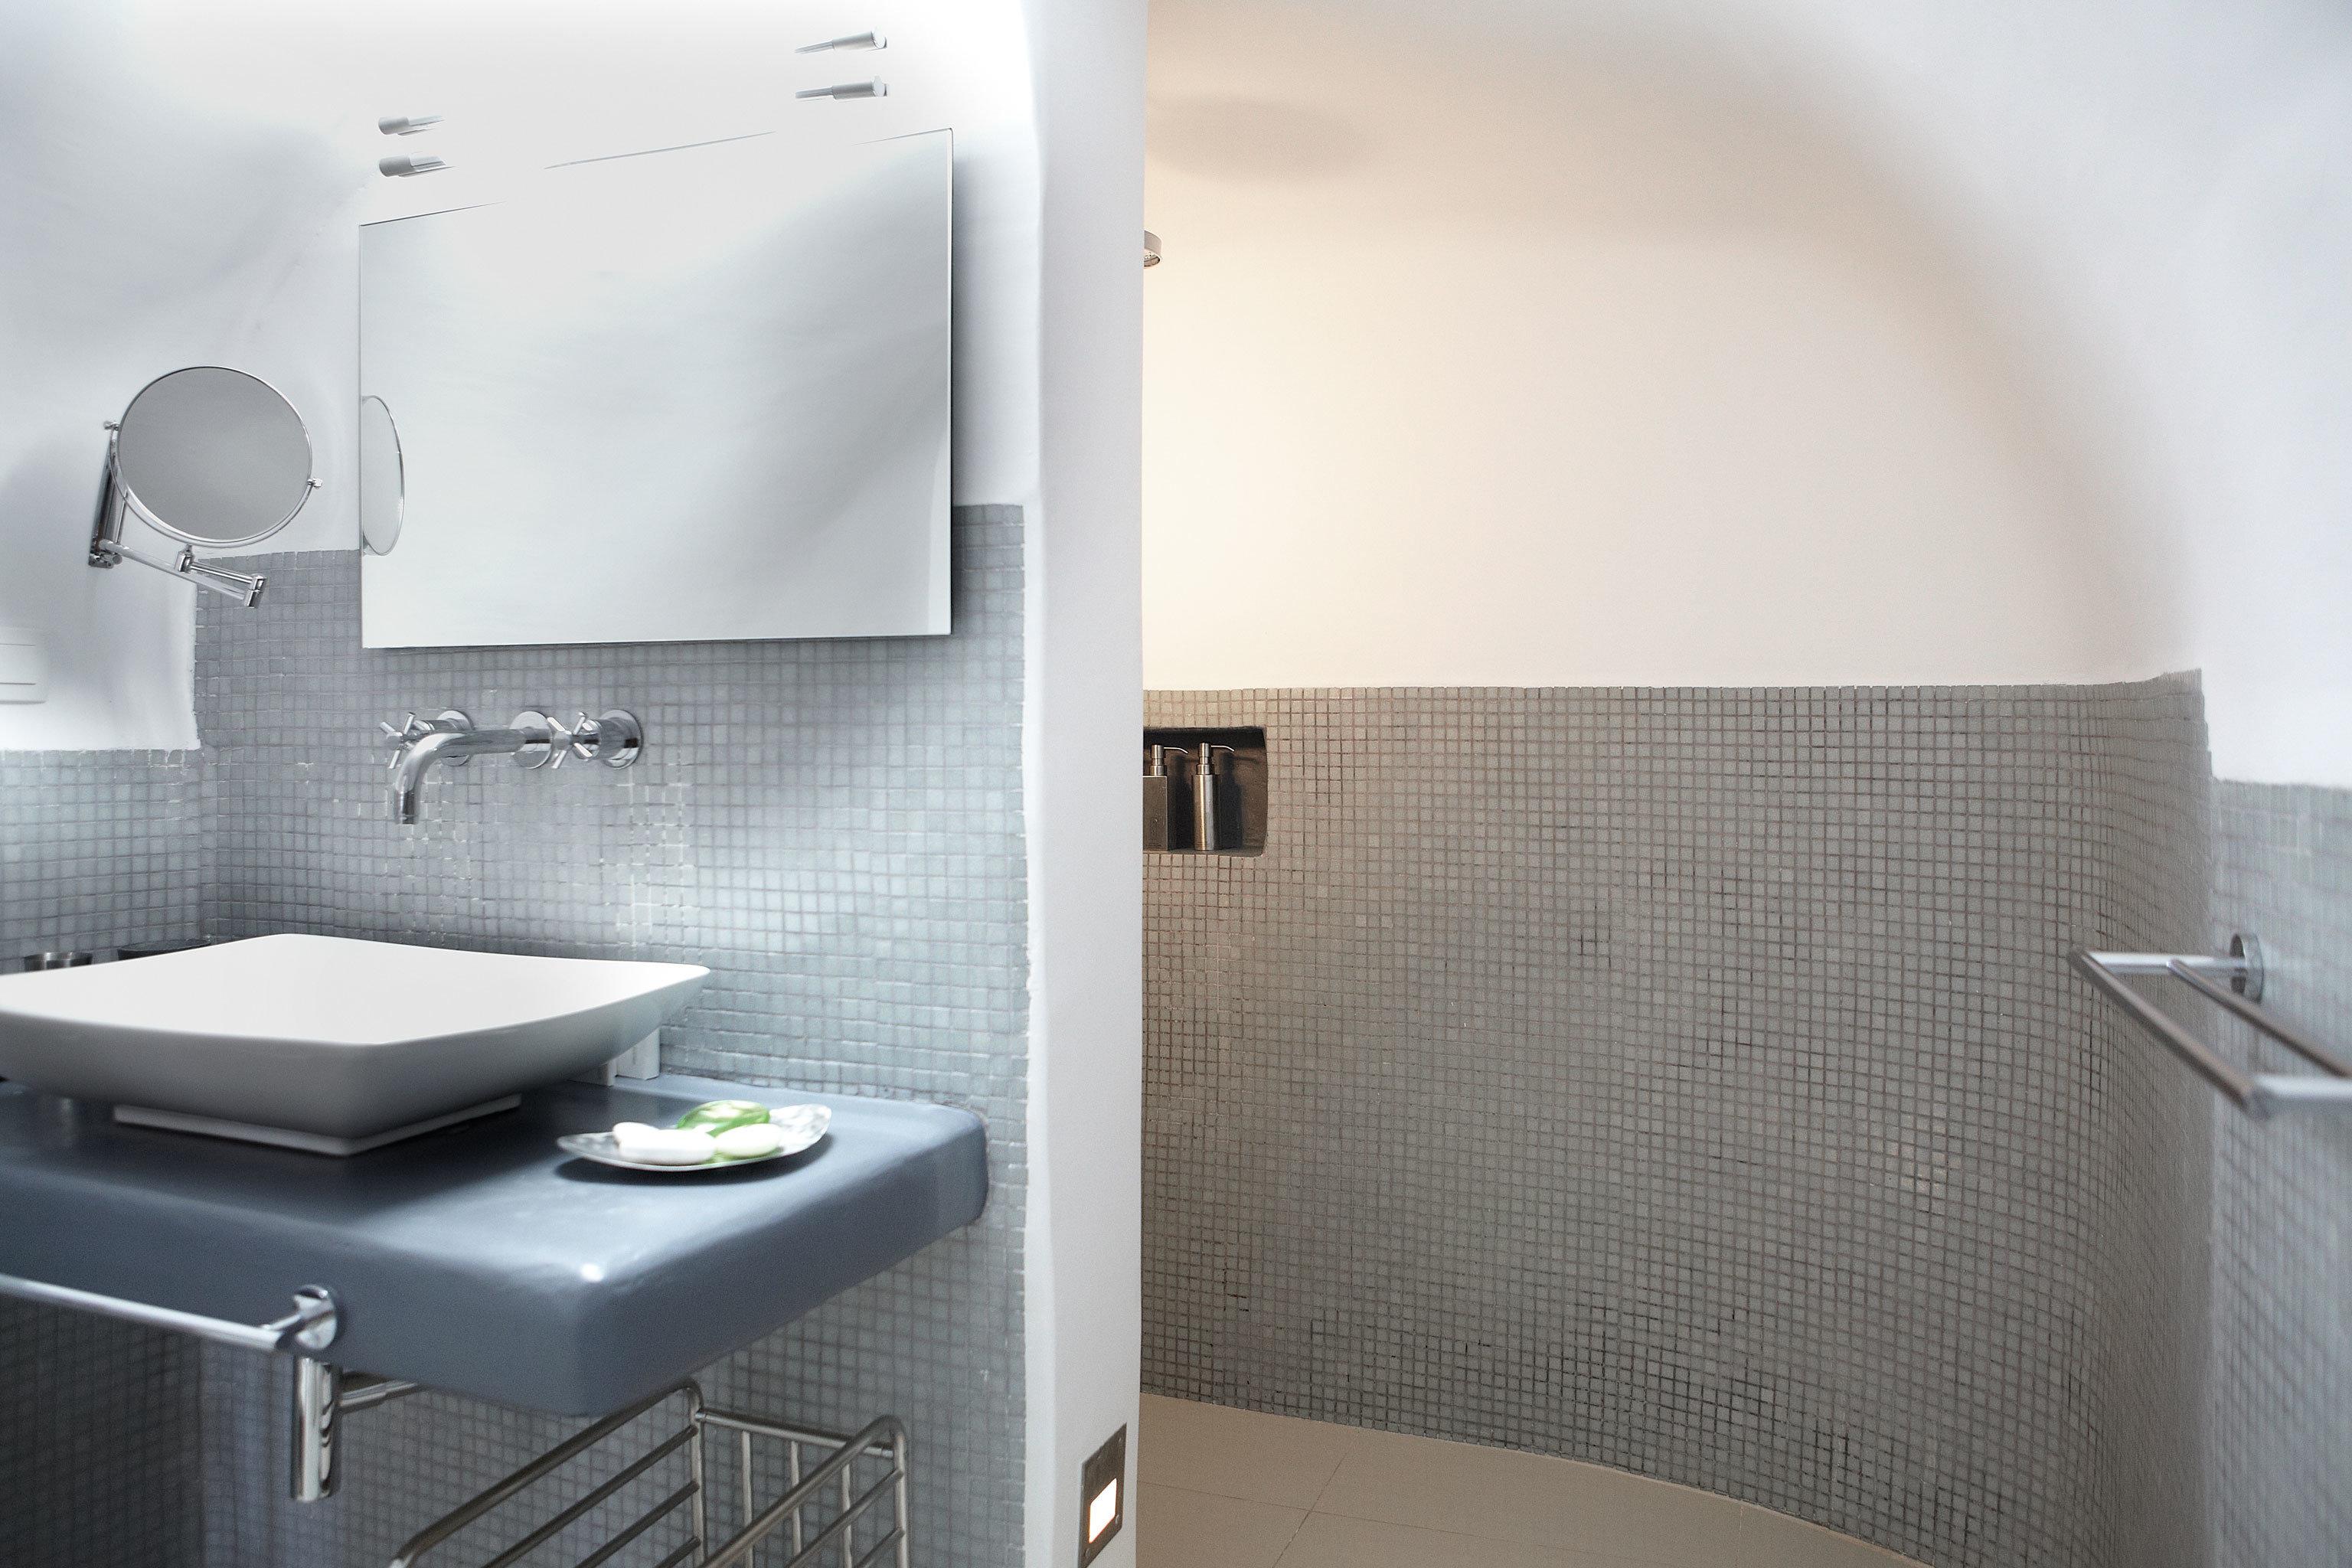 Bath Luxury Modern bathroom property bidet sink Suite bathtub tiled tile